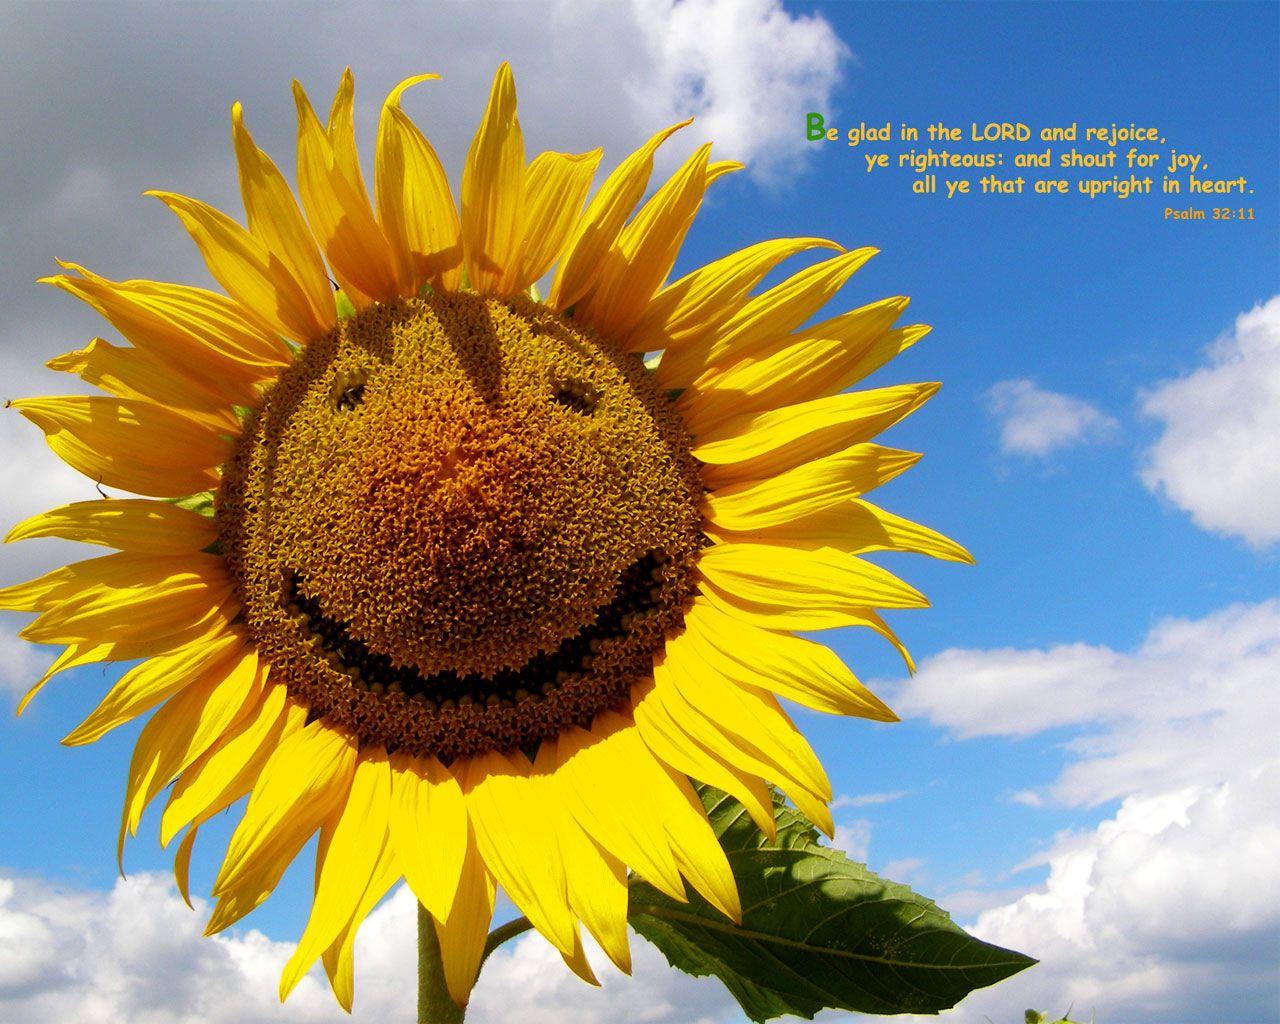 http://2.bp.blogspot.com/-2HhQbg-7oAU/Th1MSJz-zAI/AAAAAAAADTA/4ZtcZtGOdMA/s1600/Psalm-32-11-Bible-Verse.jpg